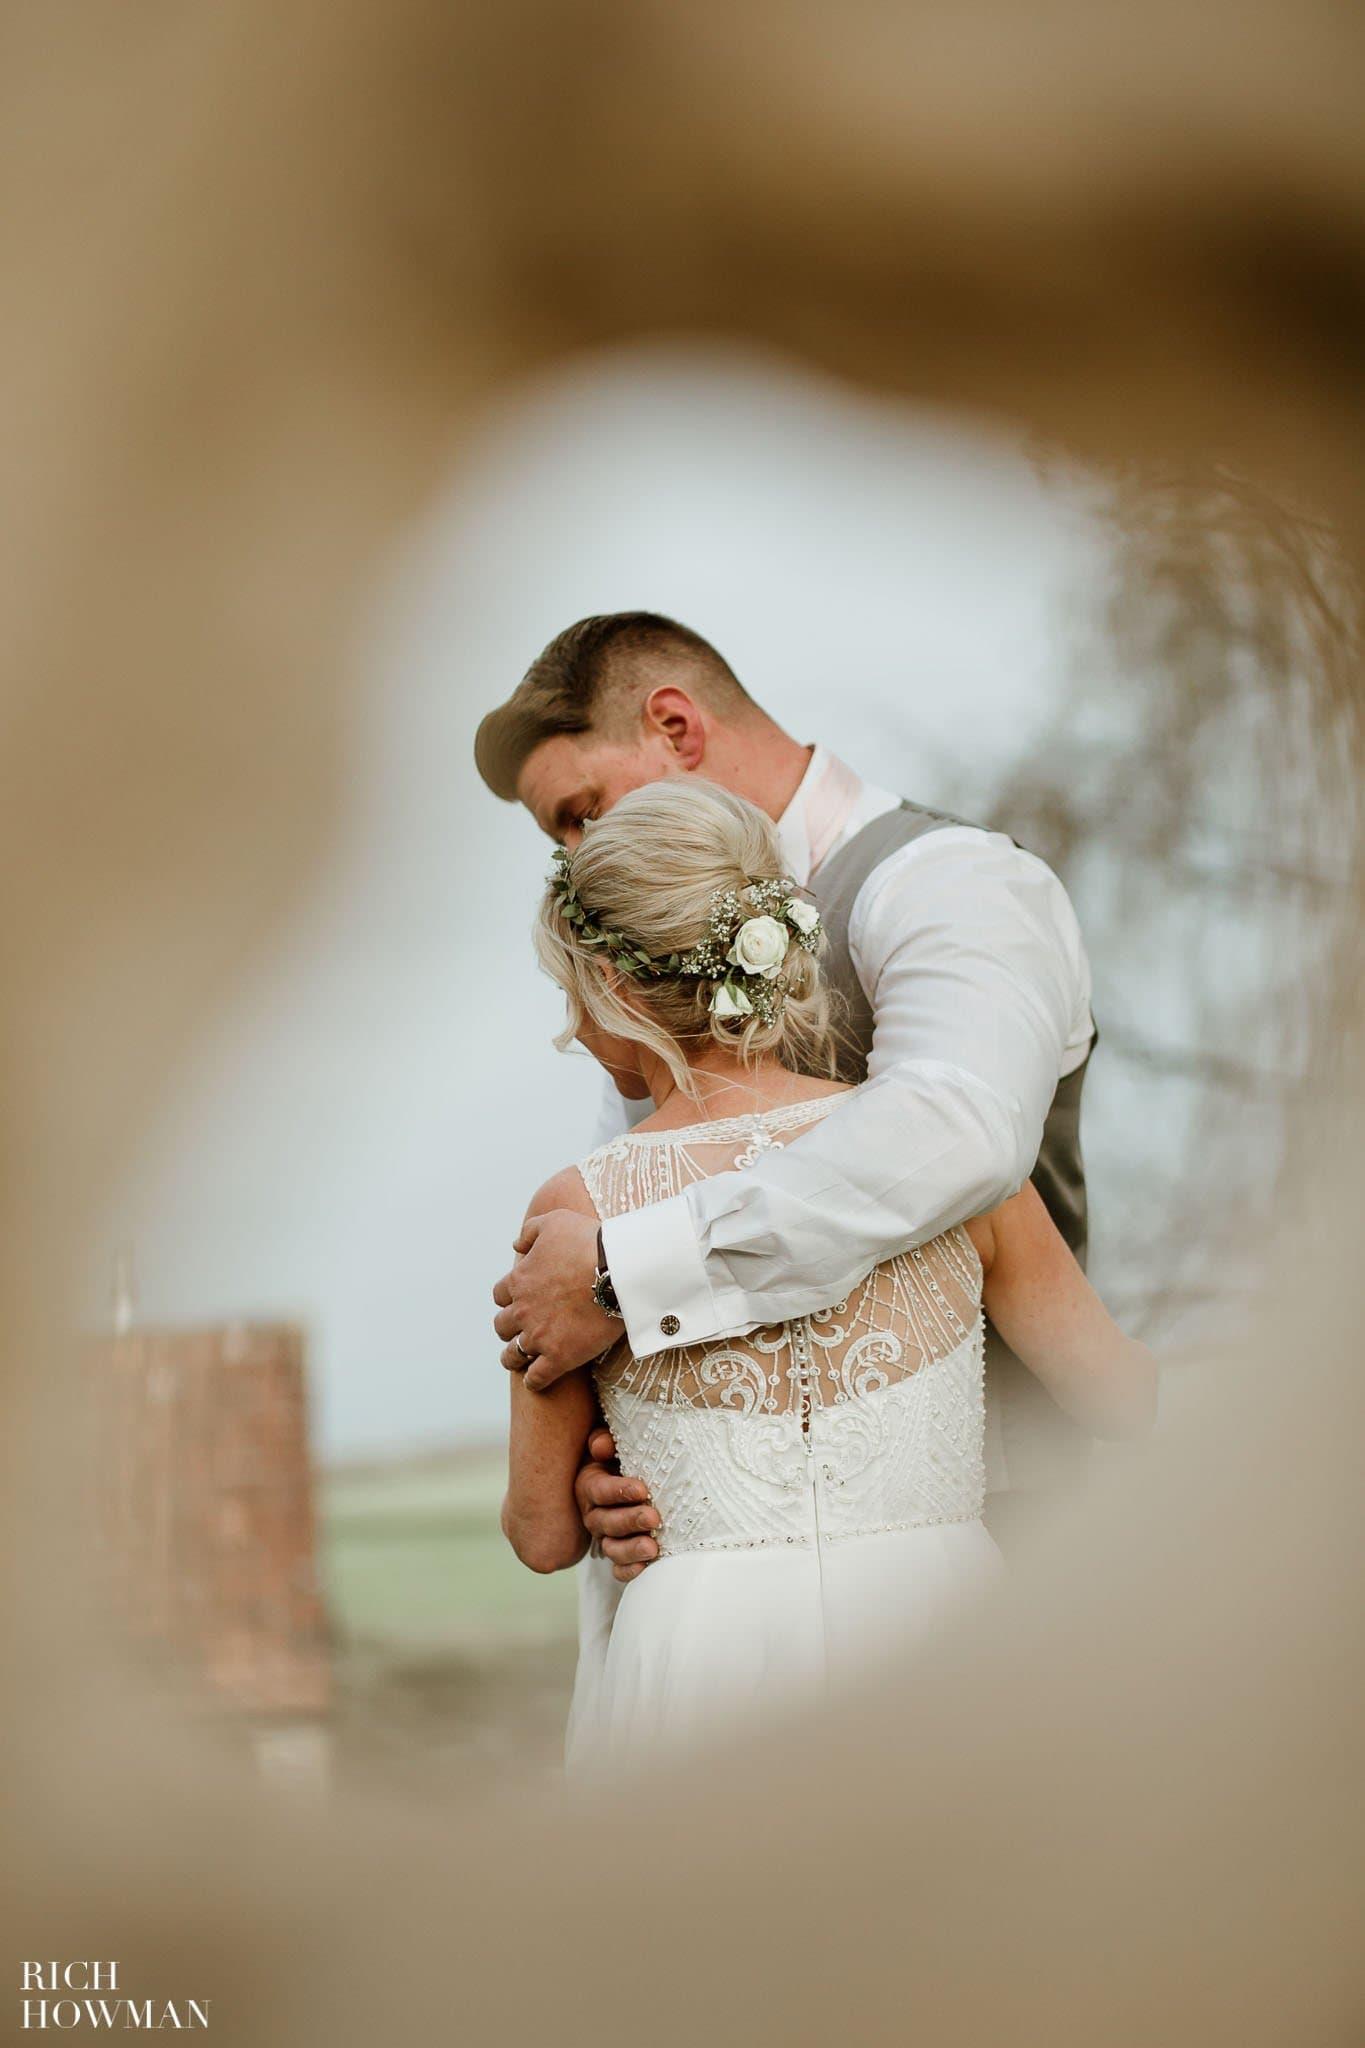 Kingscote Barn Wedding Photographer 57